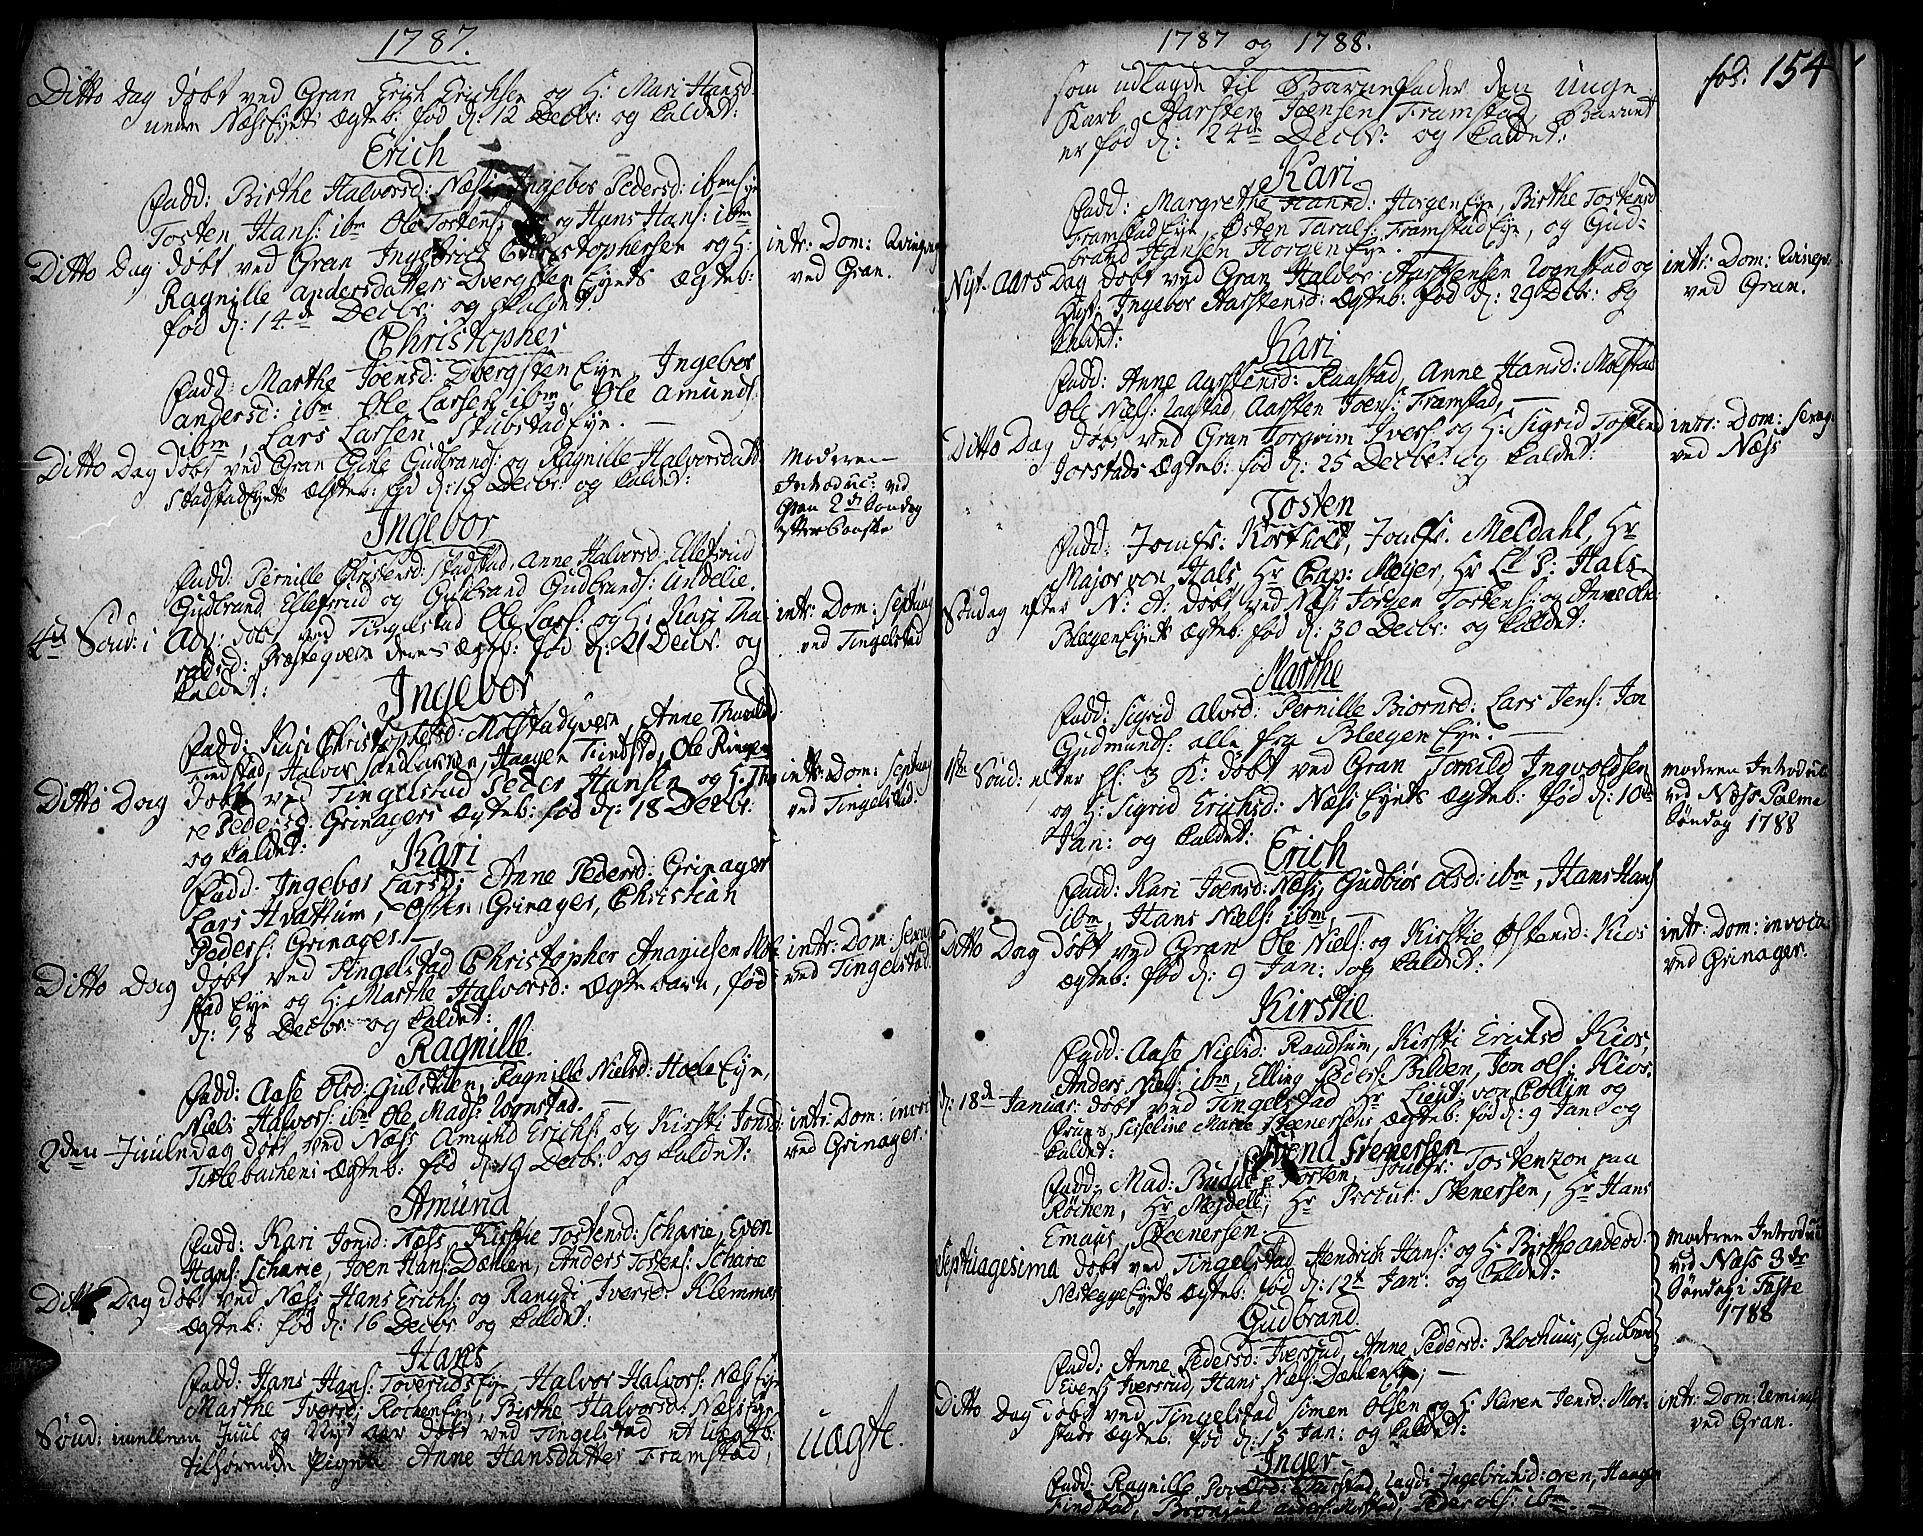 SAH, Gran prestekontor, Ministerialbok nr. 5, 1776-1788, s. 154